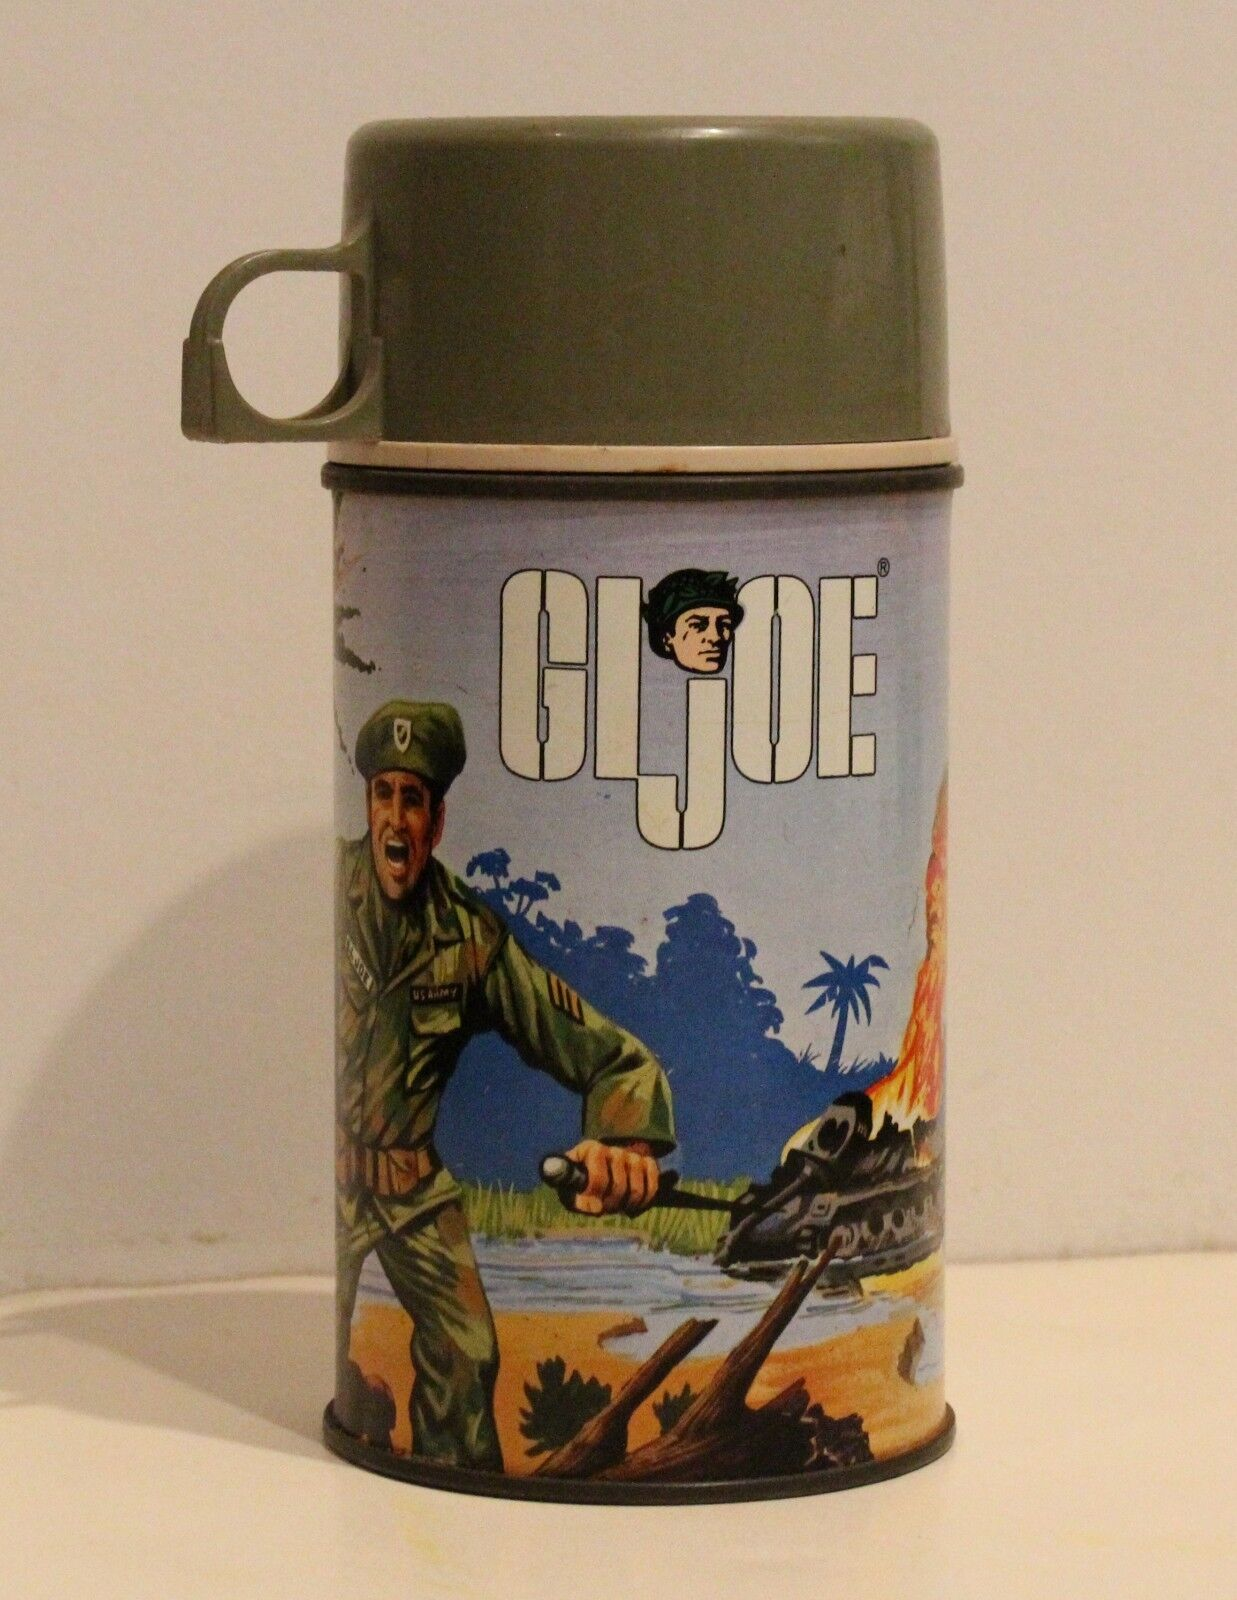 Original 1967 hasbro gi joe lunchbox thermoskanne